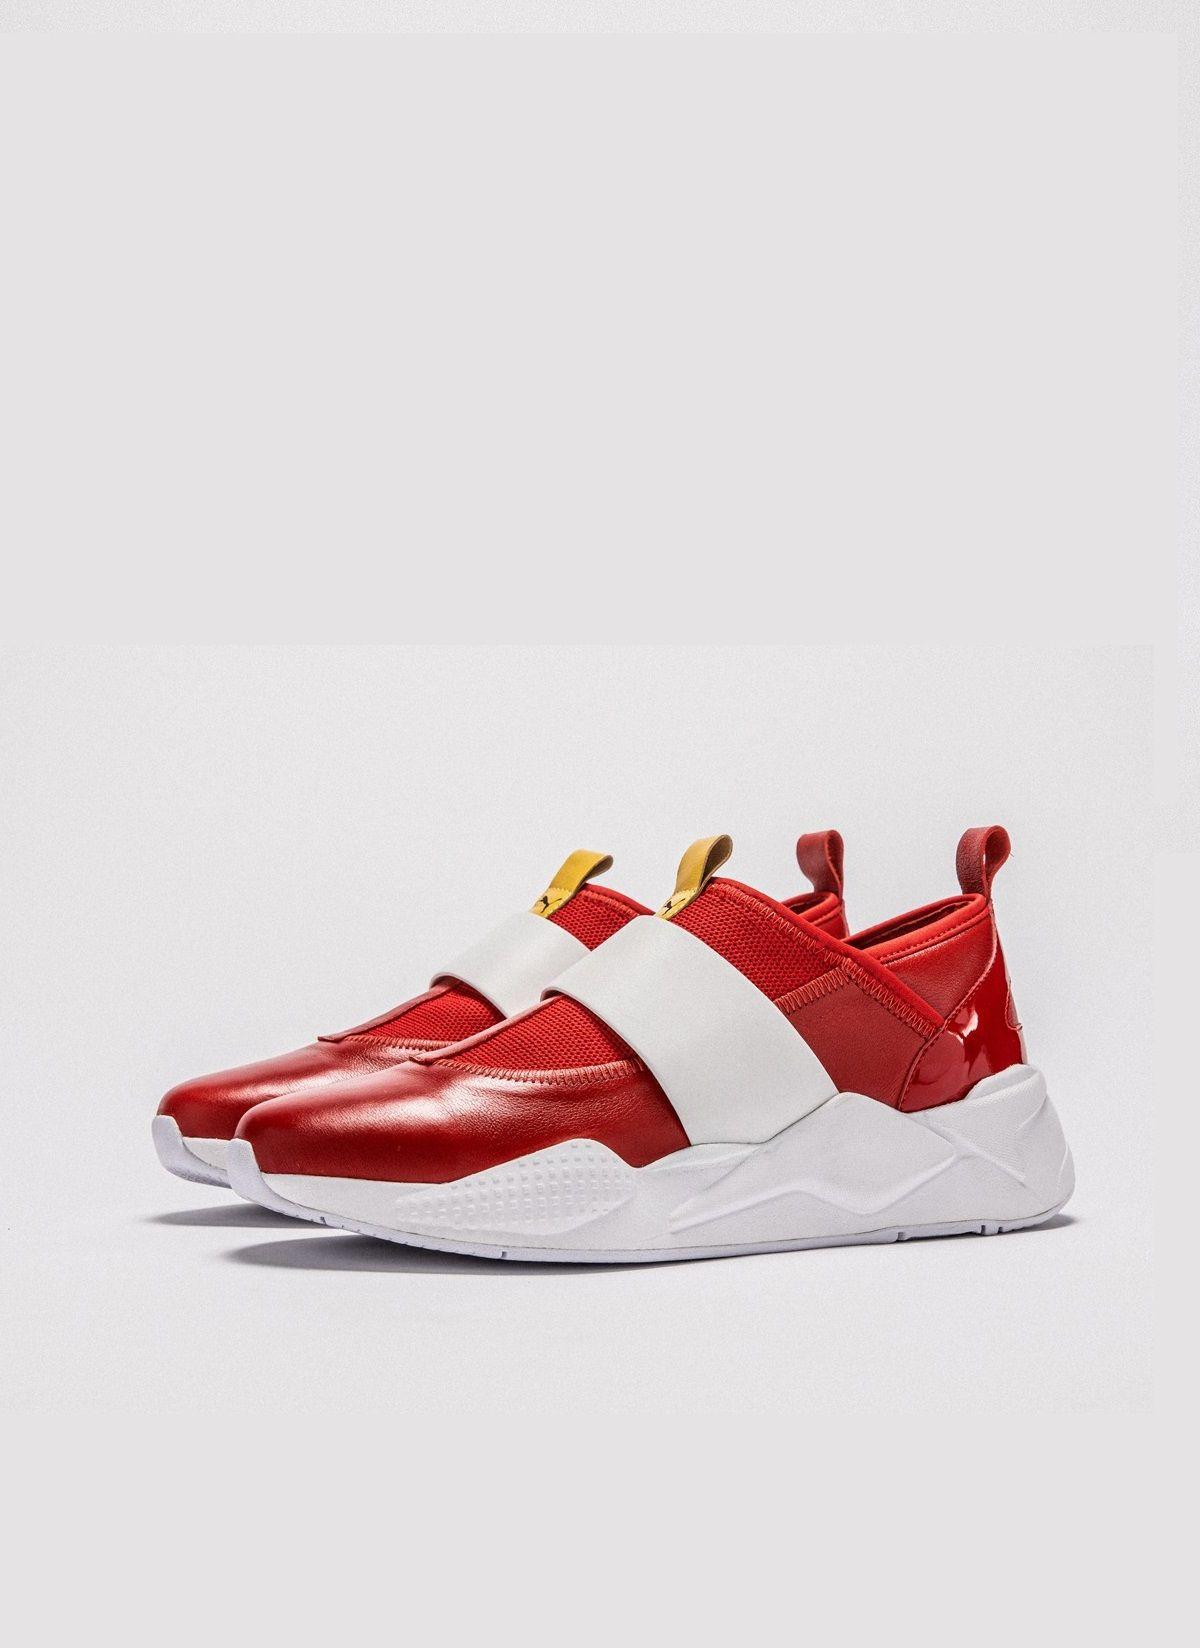 Shoe Surgeon x Puma Sonic in 2020